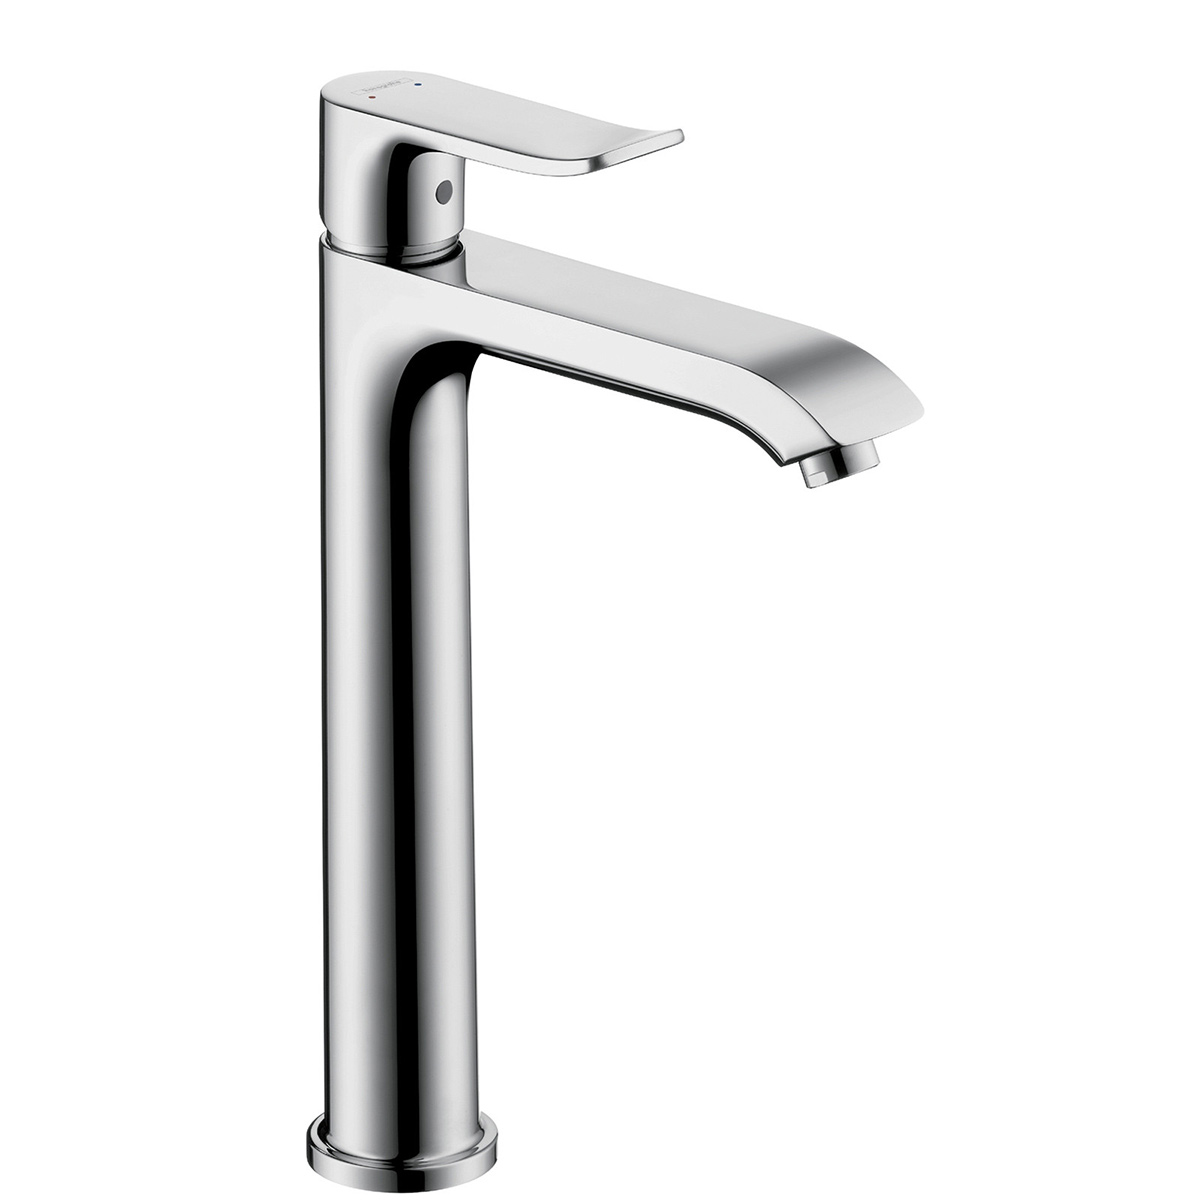 Bath4All - Hansgrohe 31183001 Chrome Metris Bathroom Faucet Vessel ...